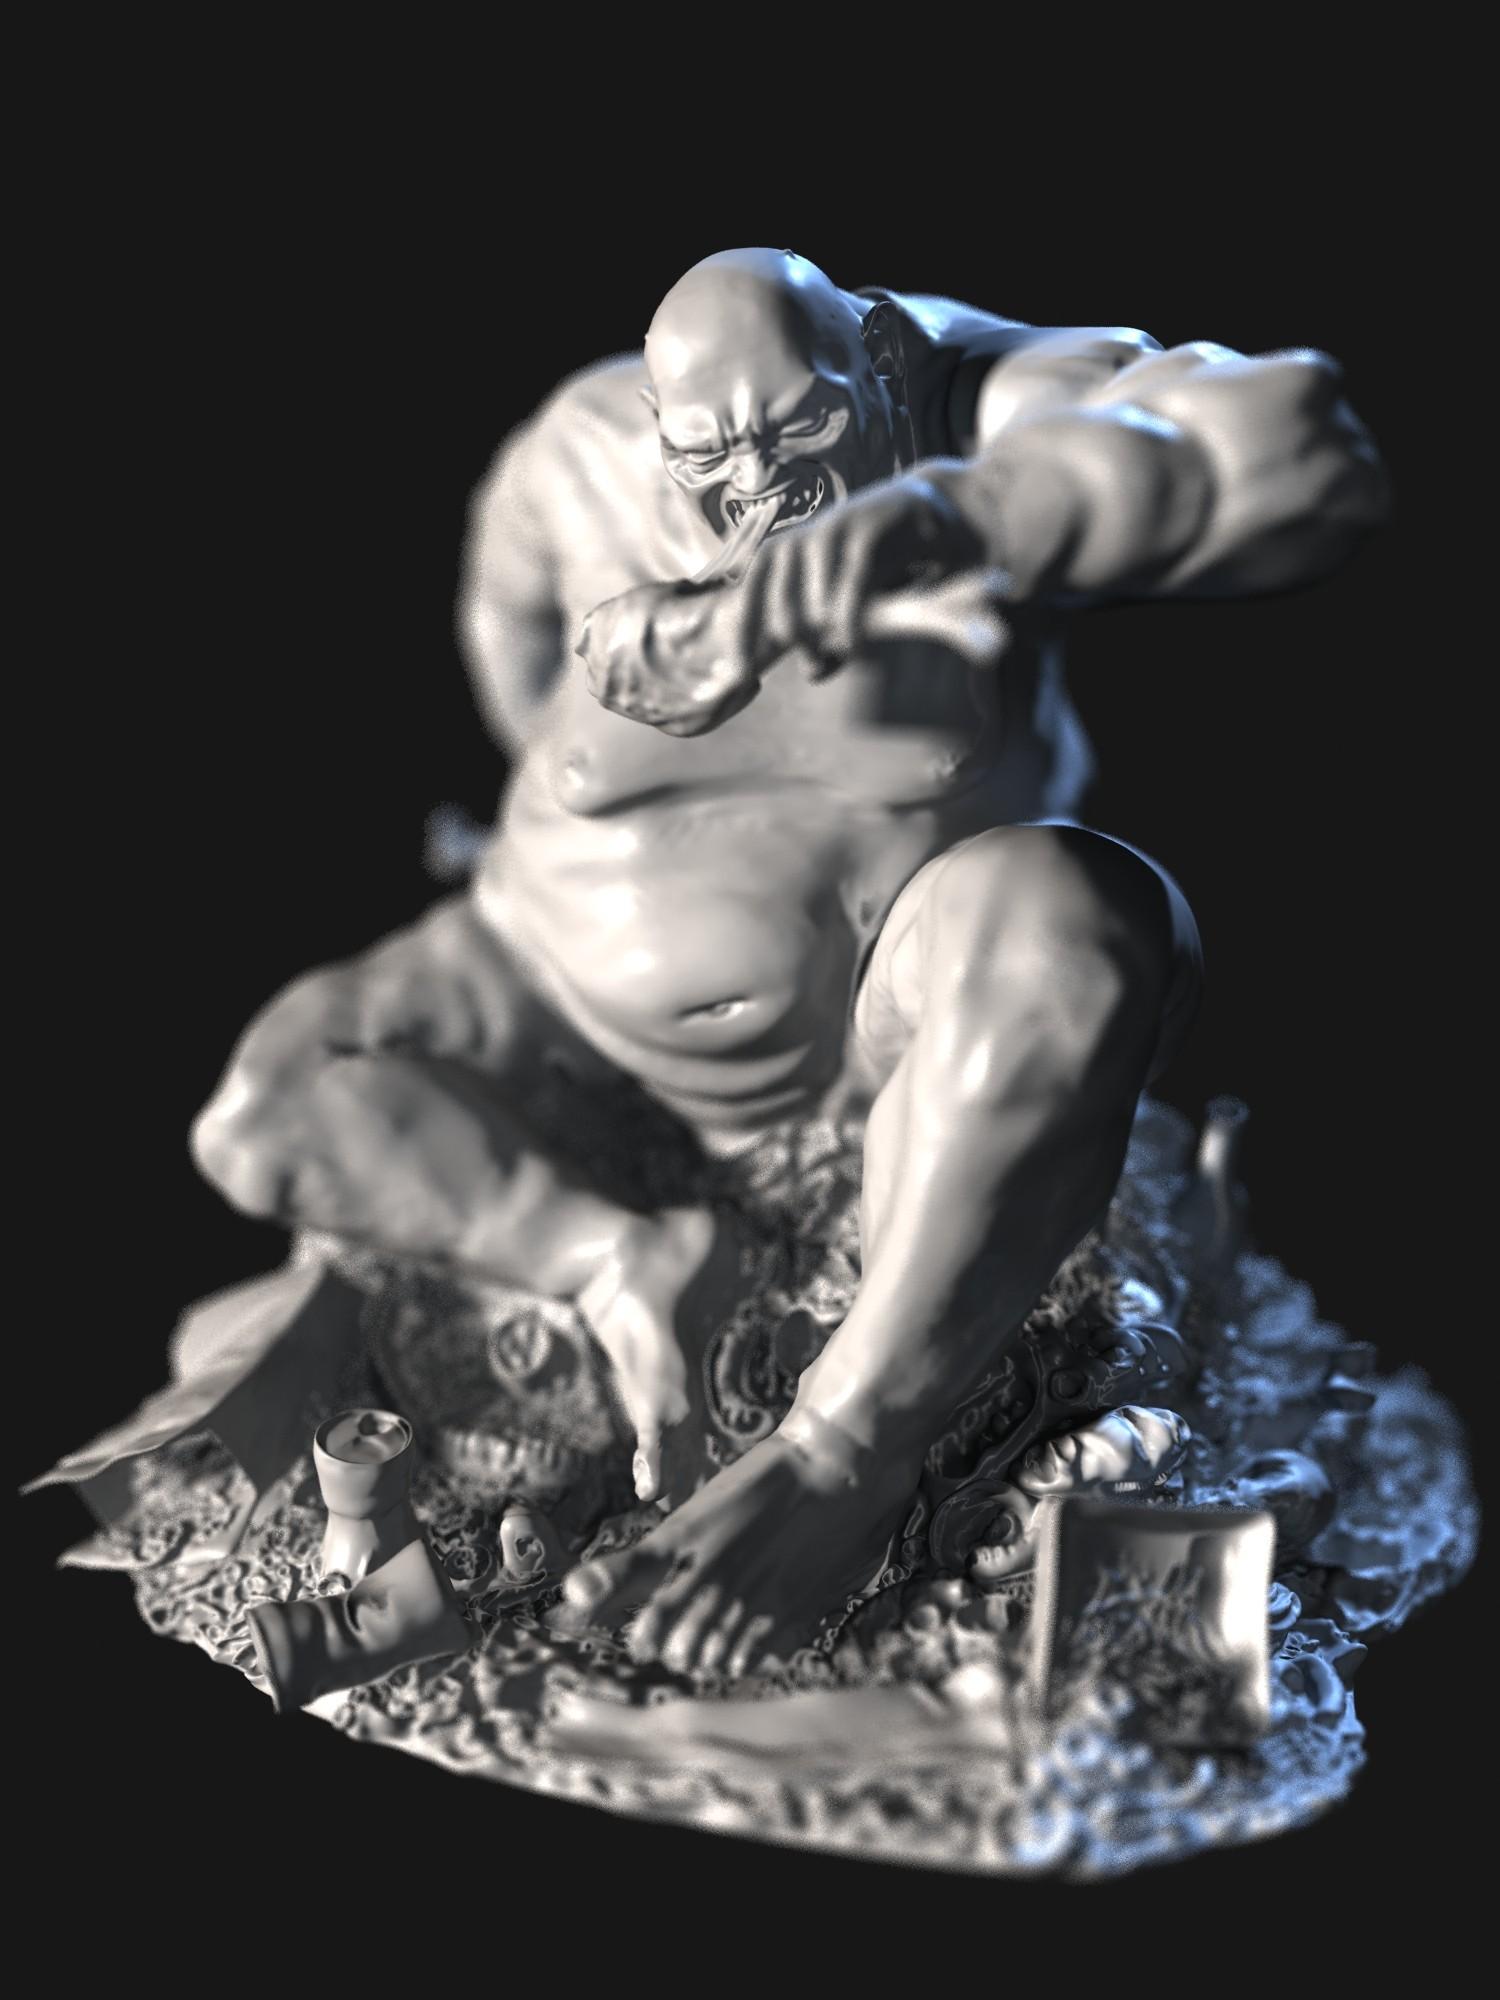 Dani santos test estatua 2